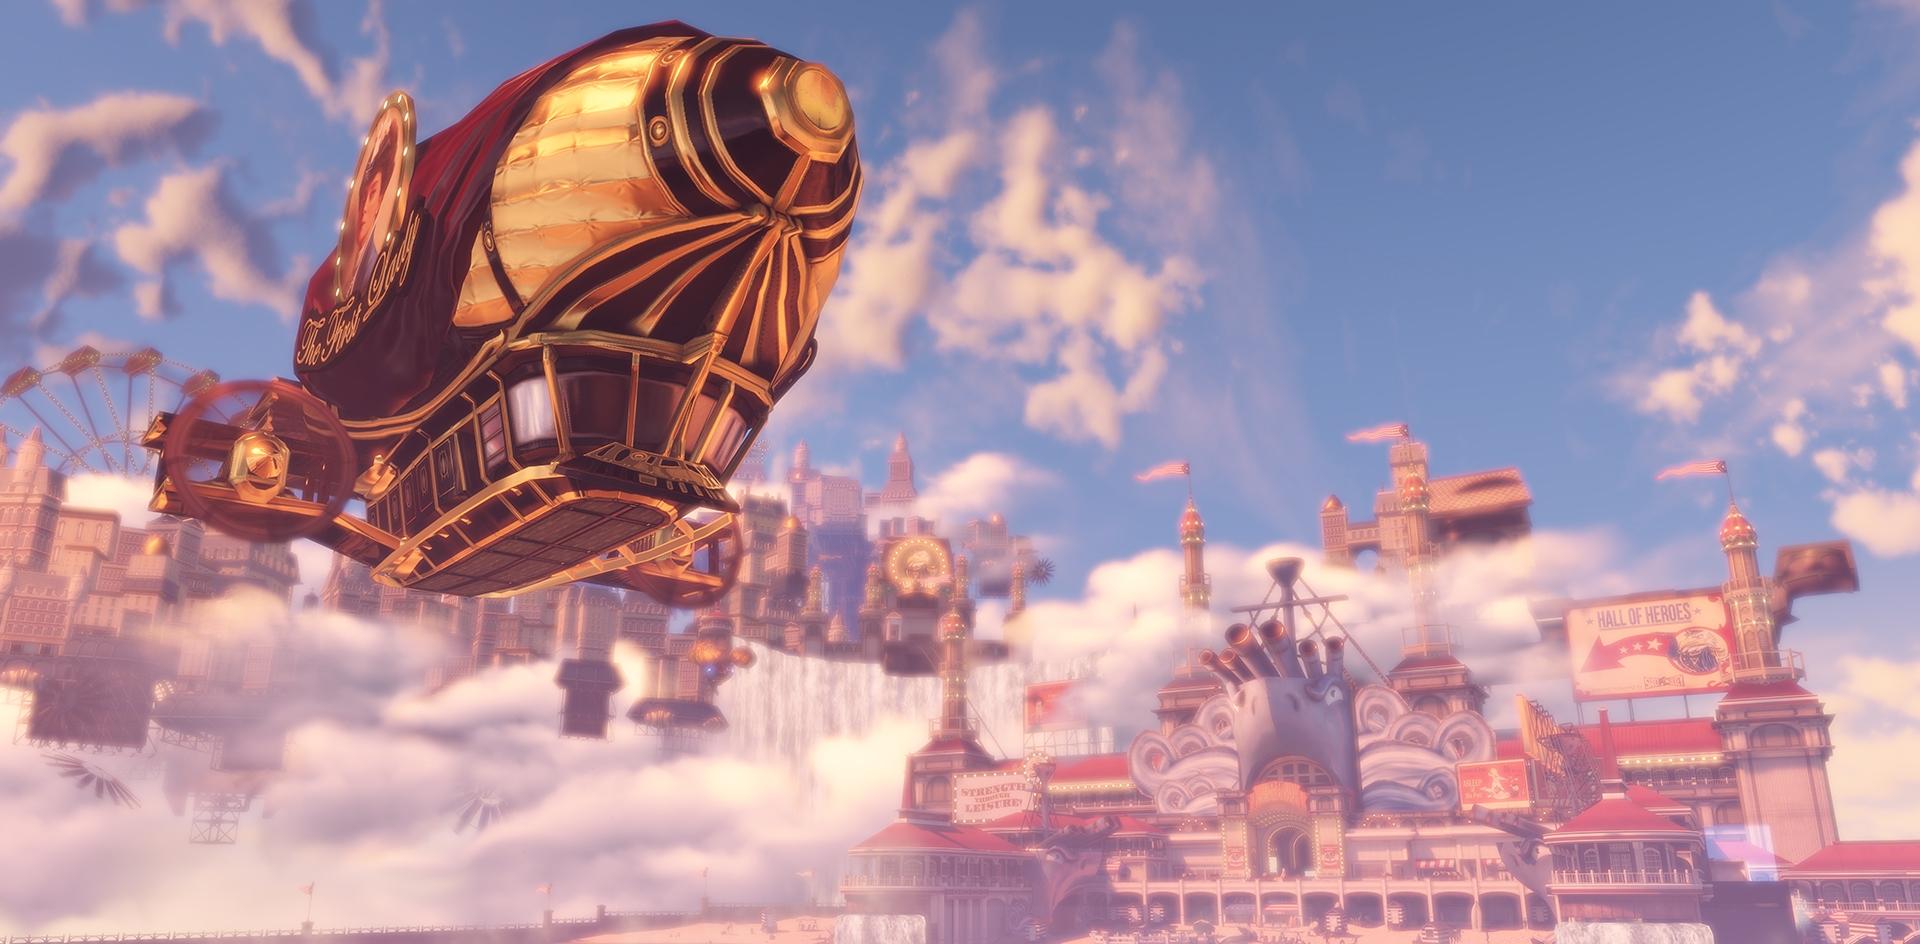 cloud city by bioshock